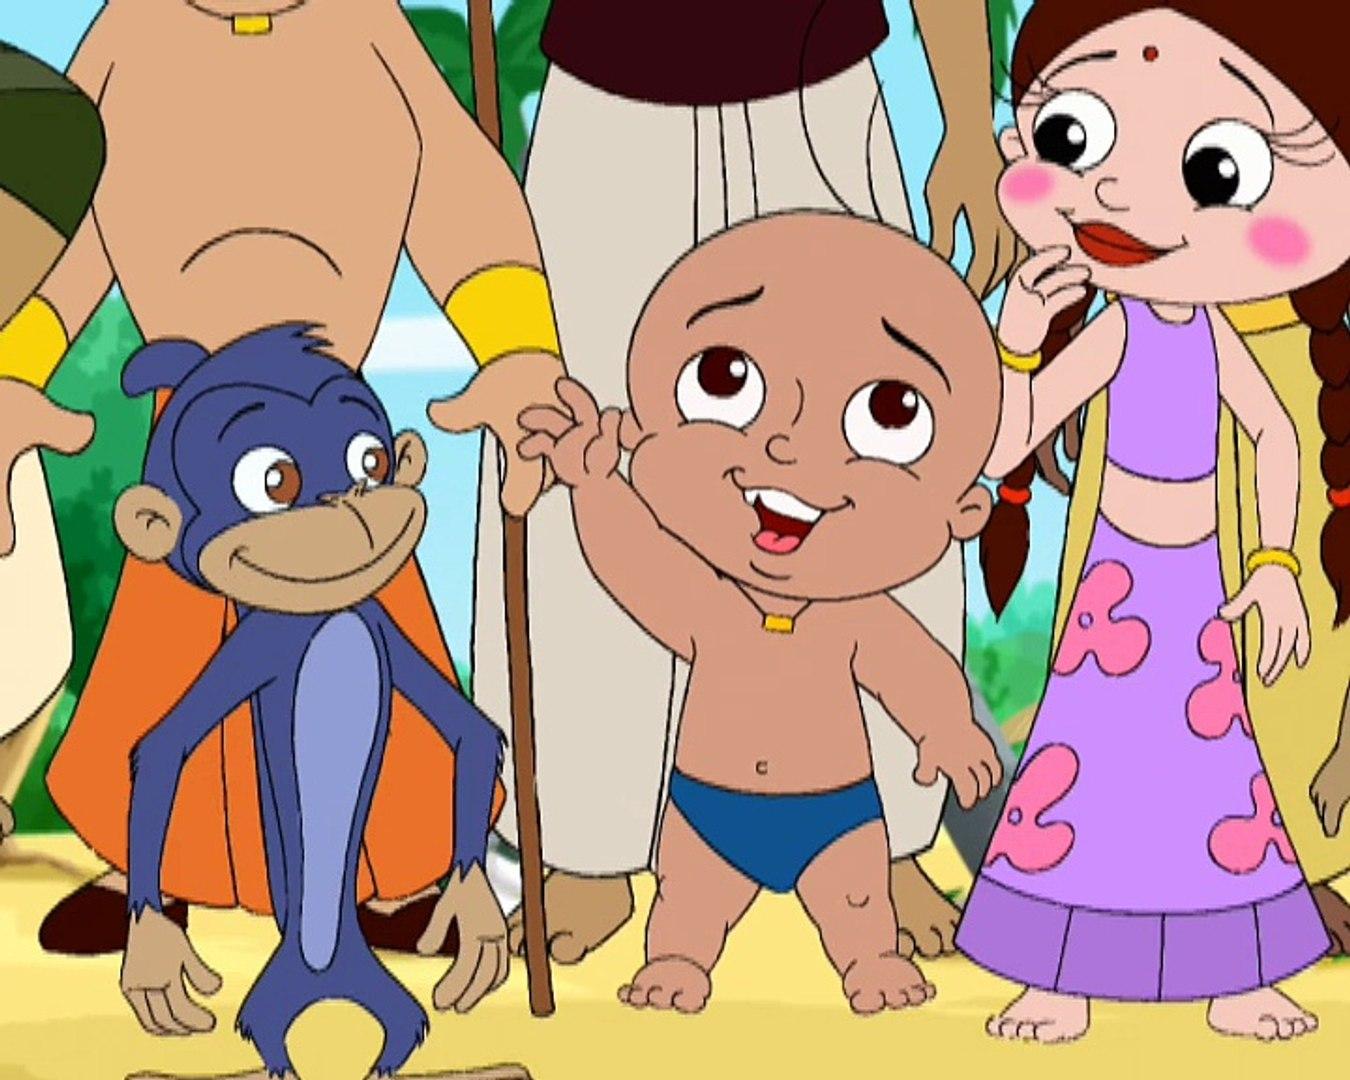 Jadugar Raju Chota Bheem In Hindi Hd Cartoons Episode 04 Video Dailymotion